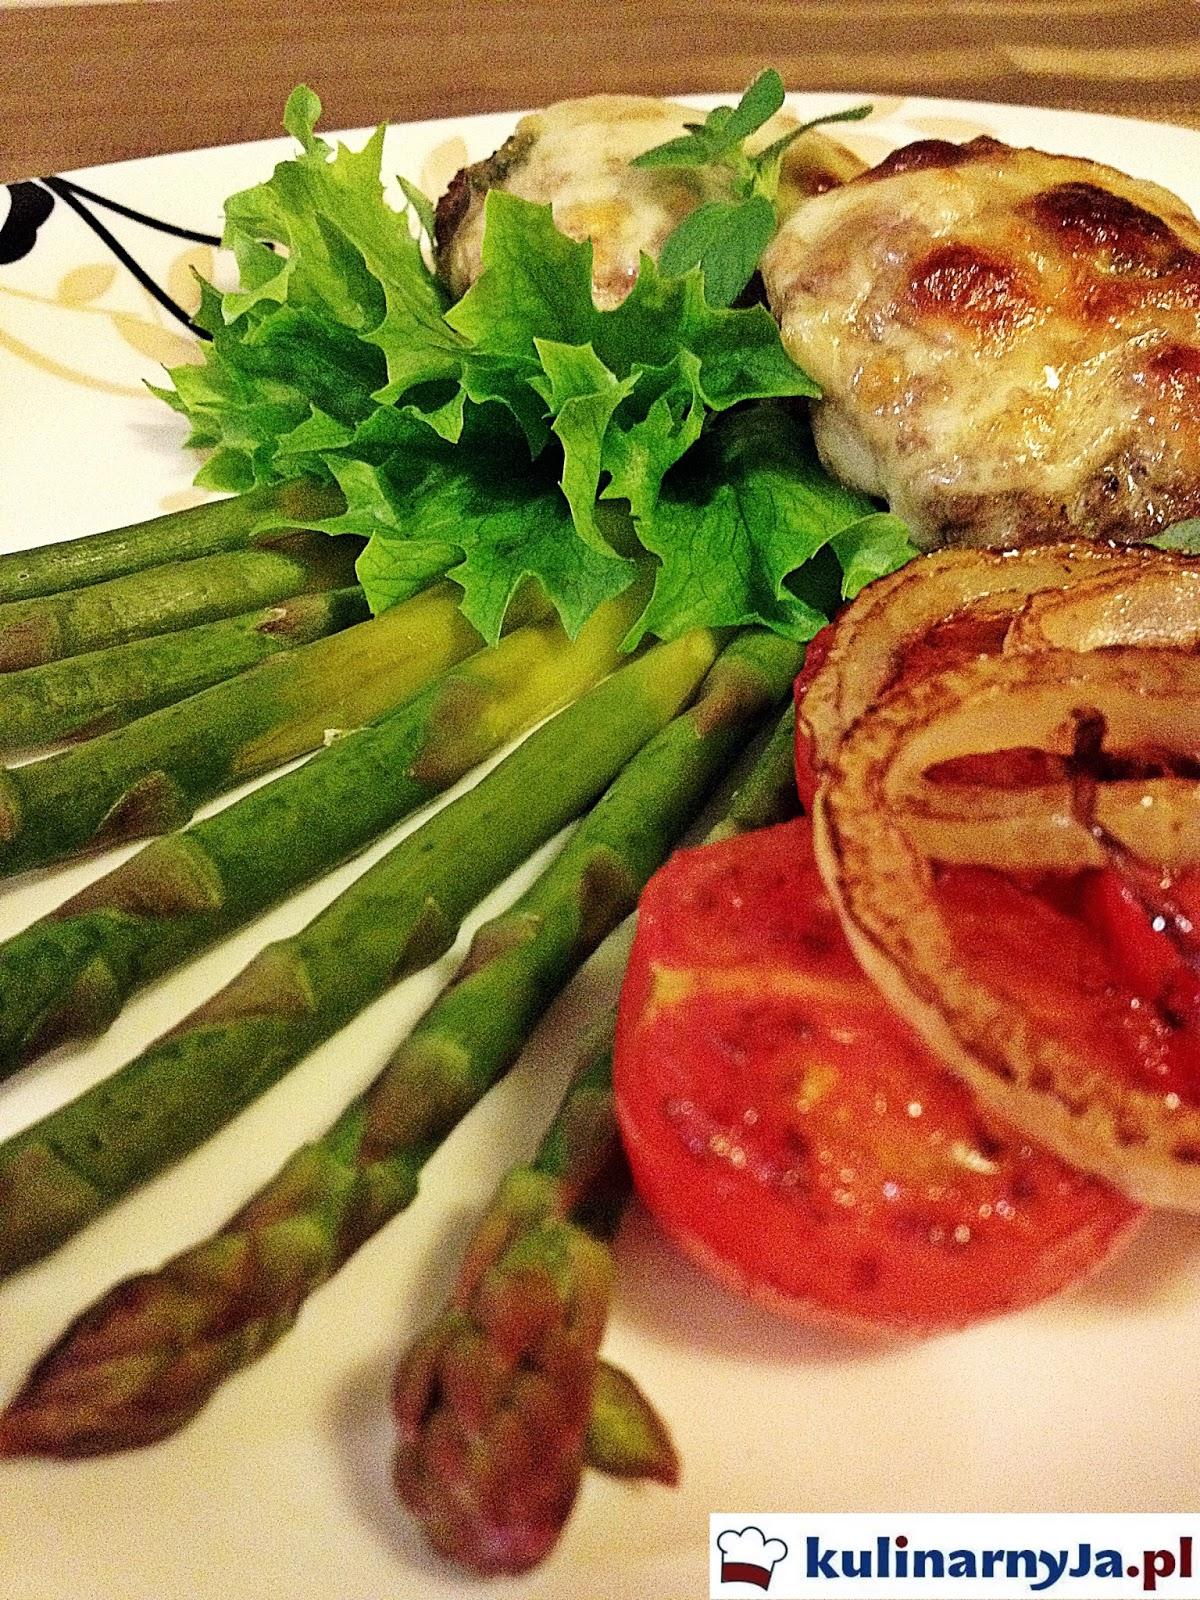 Kotlety z wołowiny z imbirem, oregano i mozzarellą